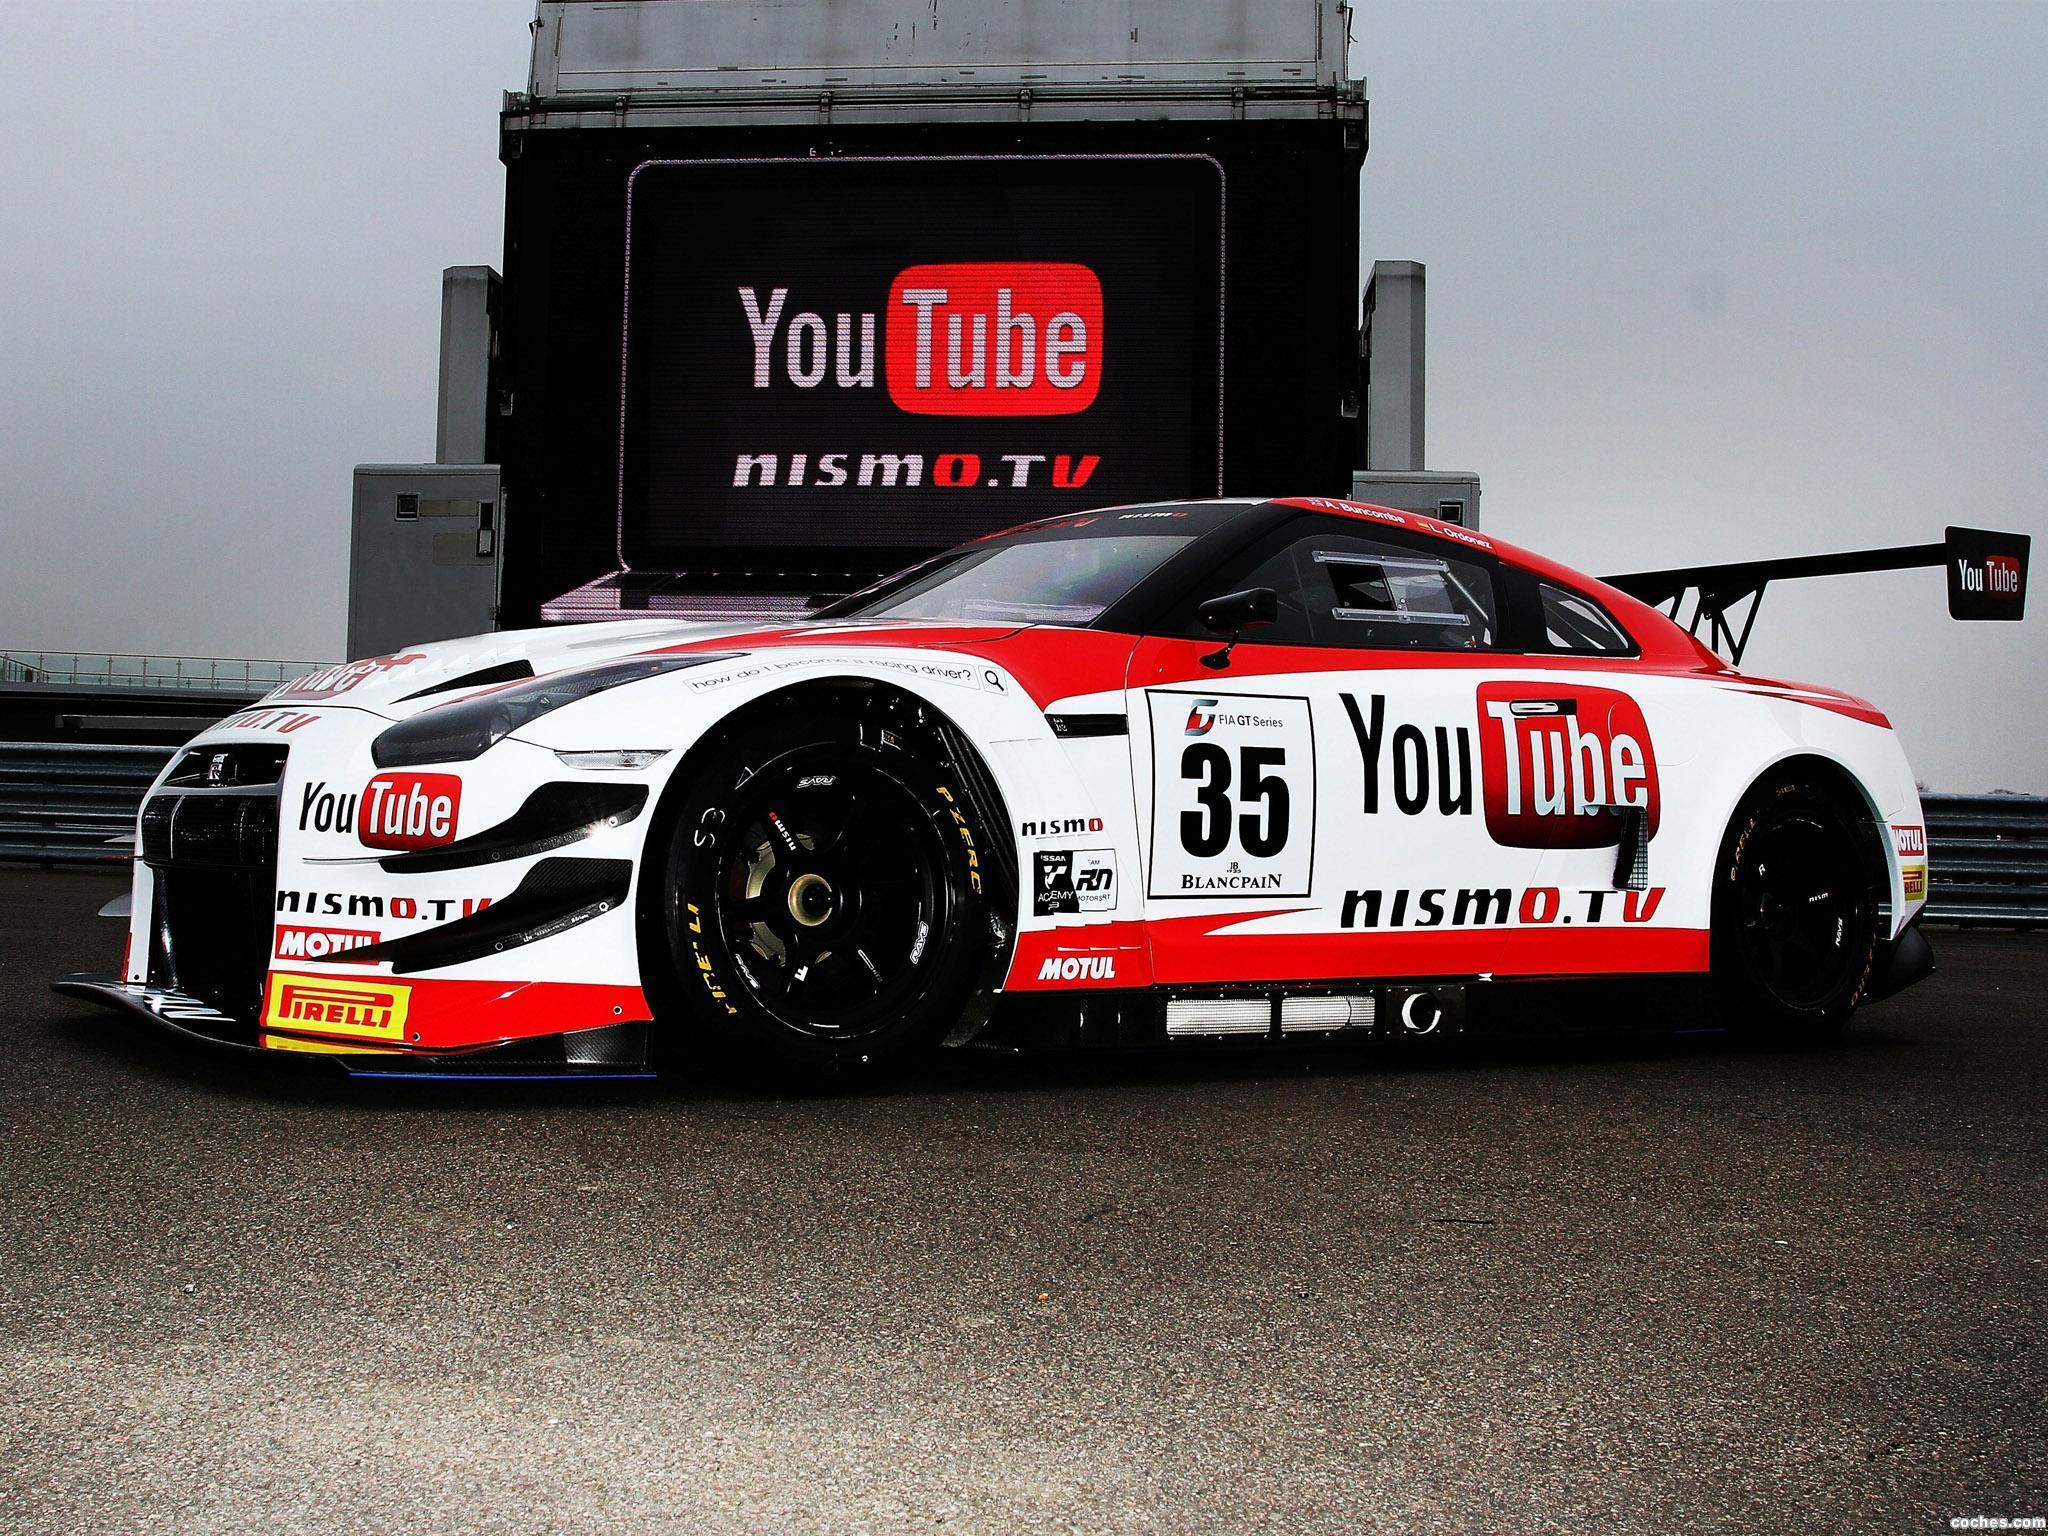 Foto 0 de Nissan Nissan GT-R Youtube nismo 2013